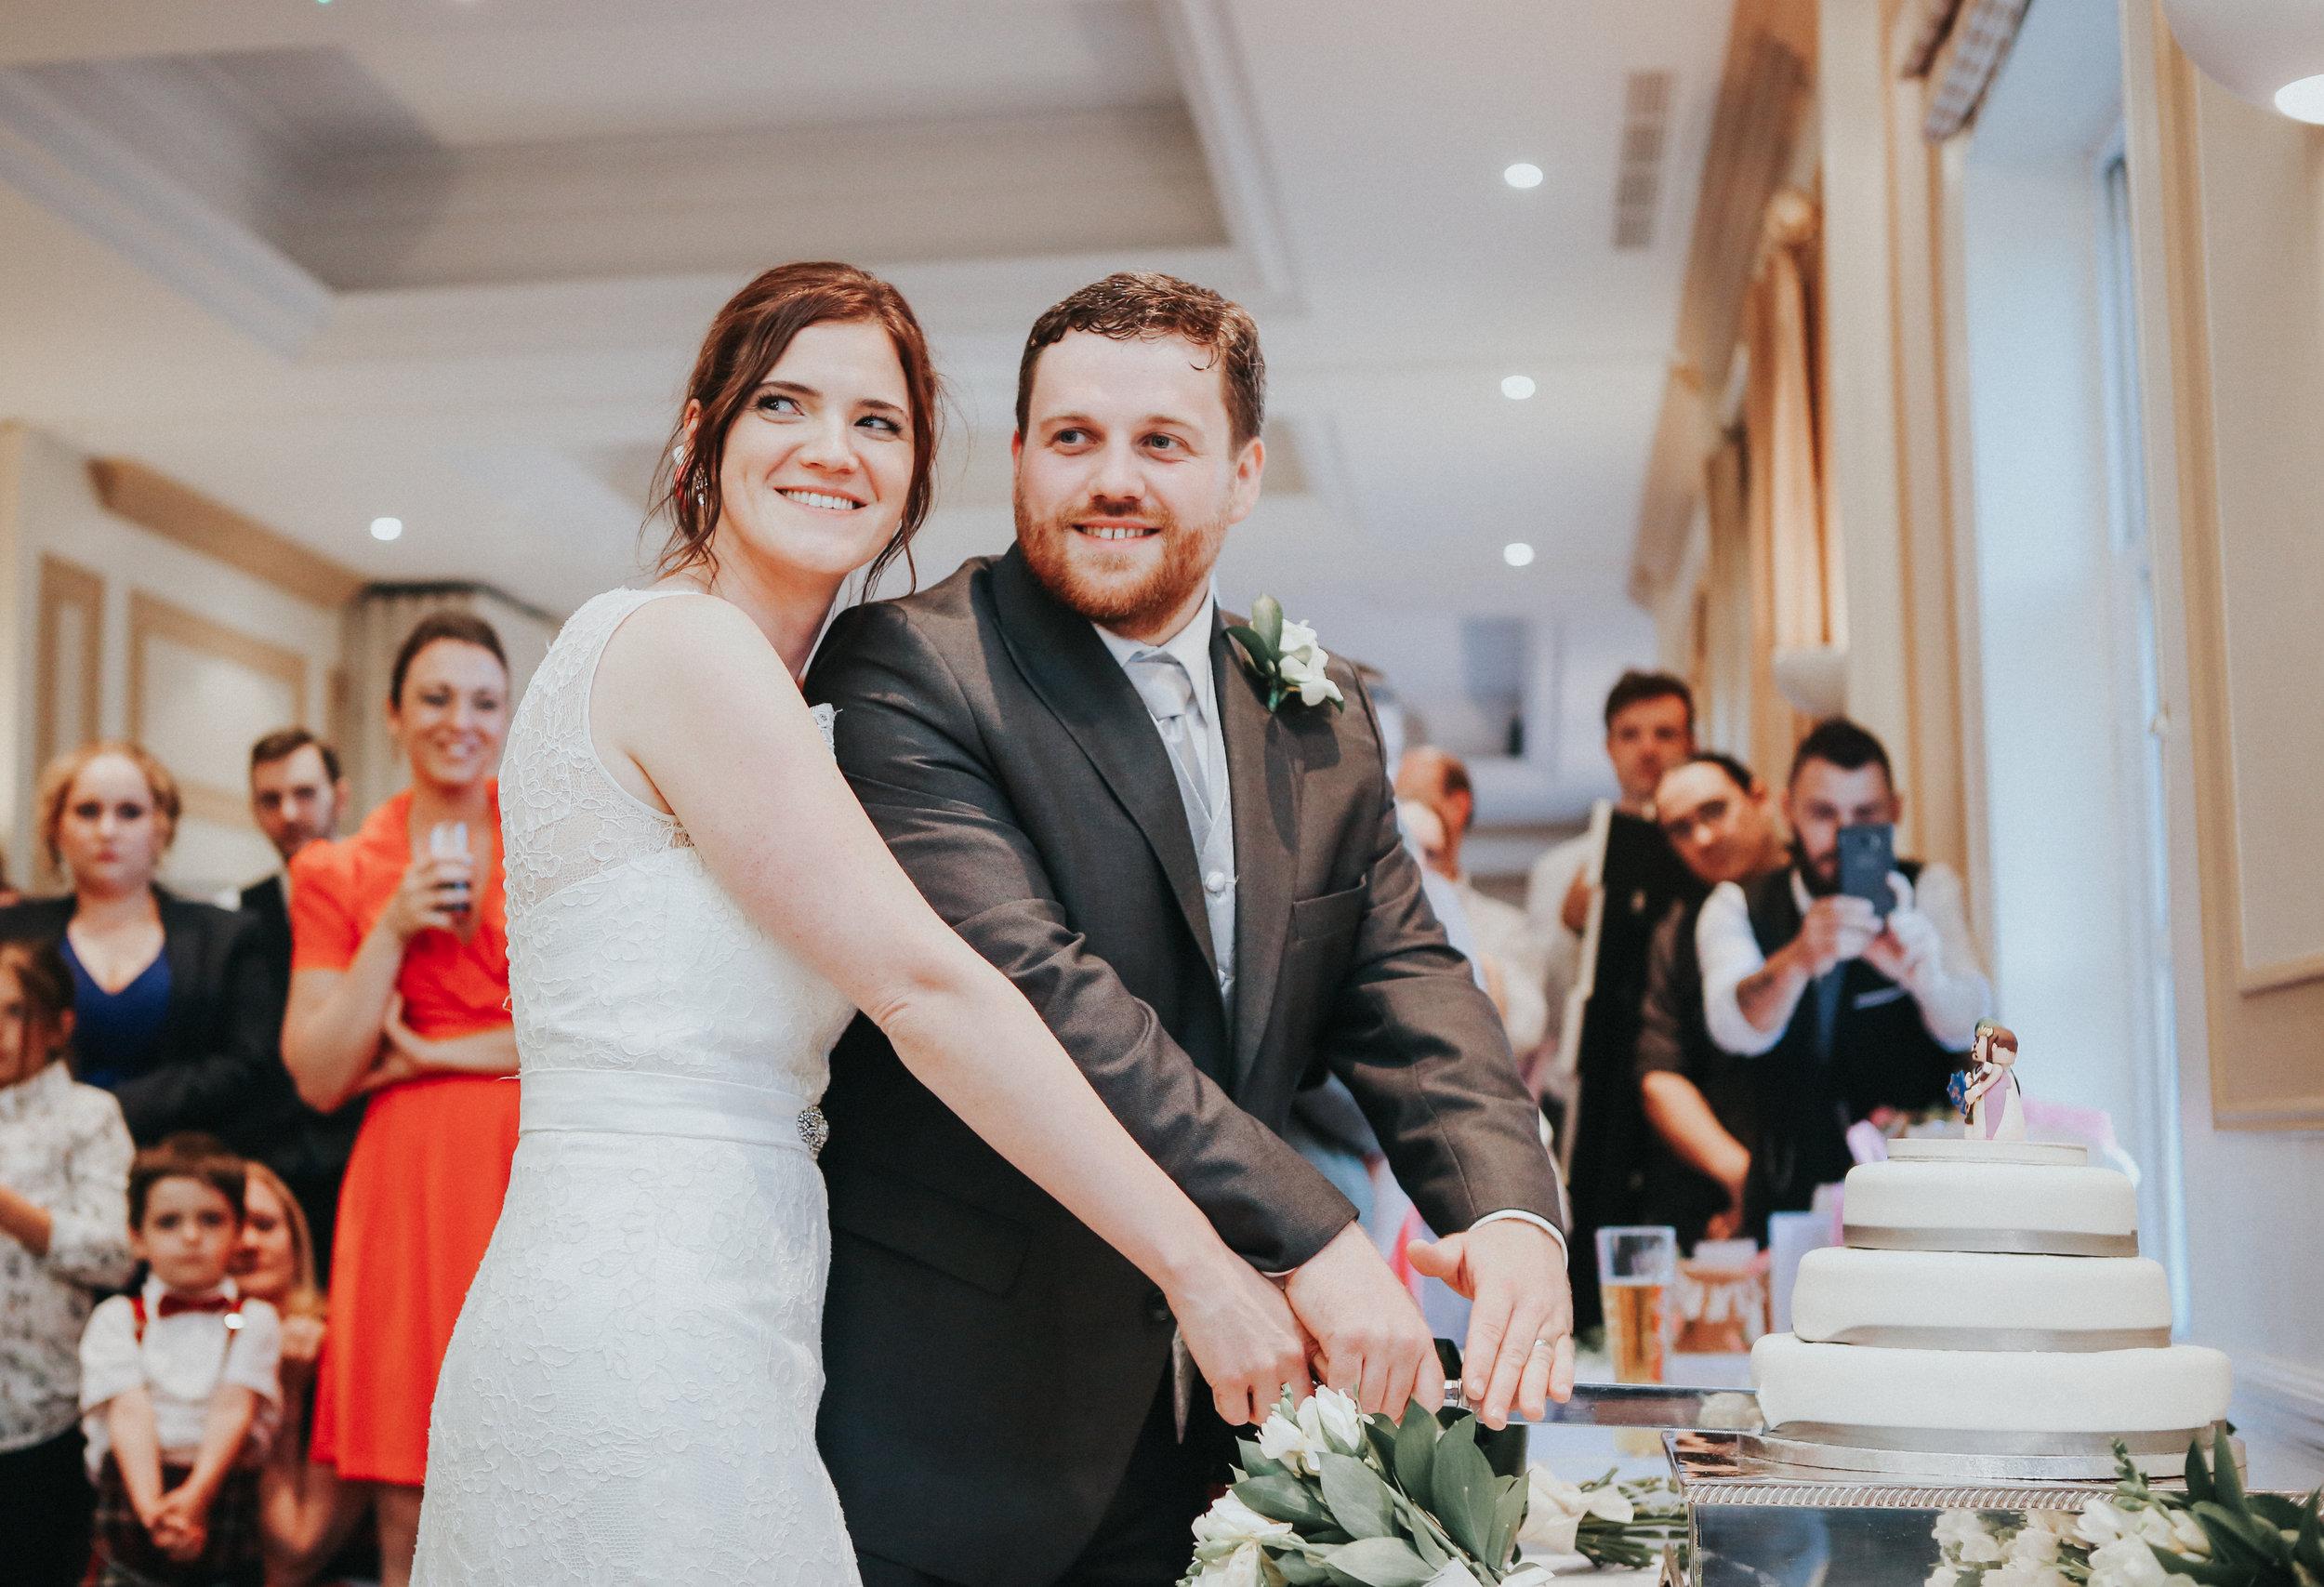 reigate-surrey-london-wedding-photography-group-formal-shot-reception-woldingham-golf-club-bridal-portrait-cake-cut-107